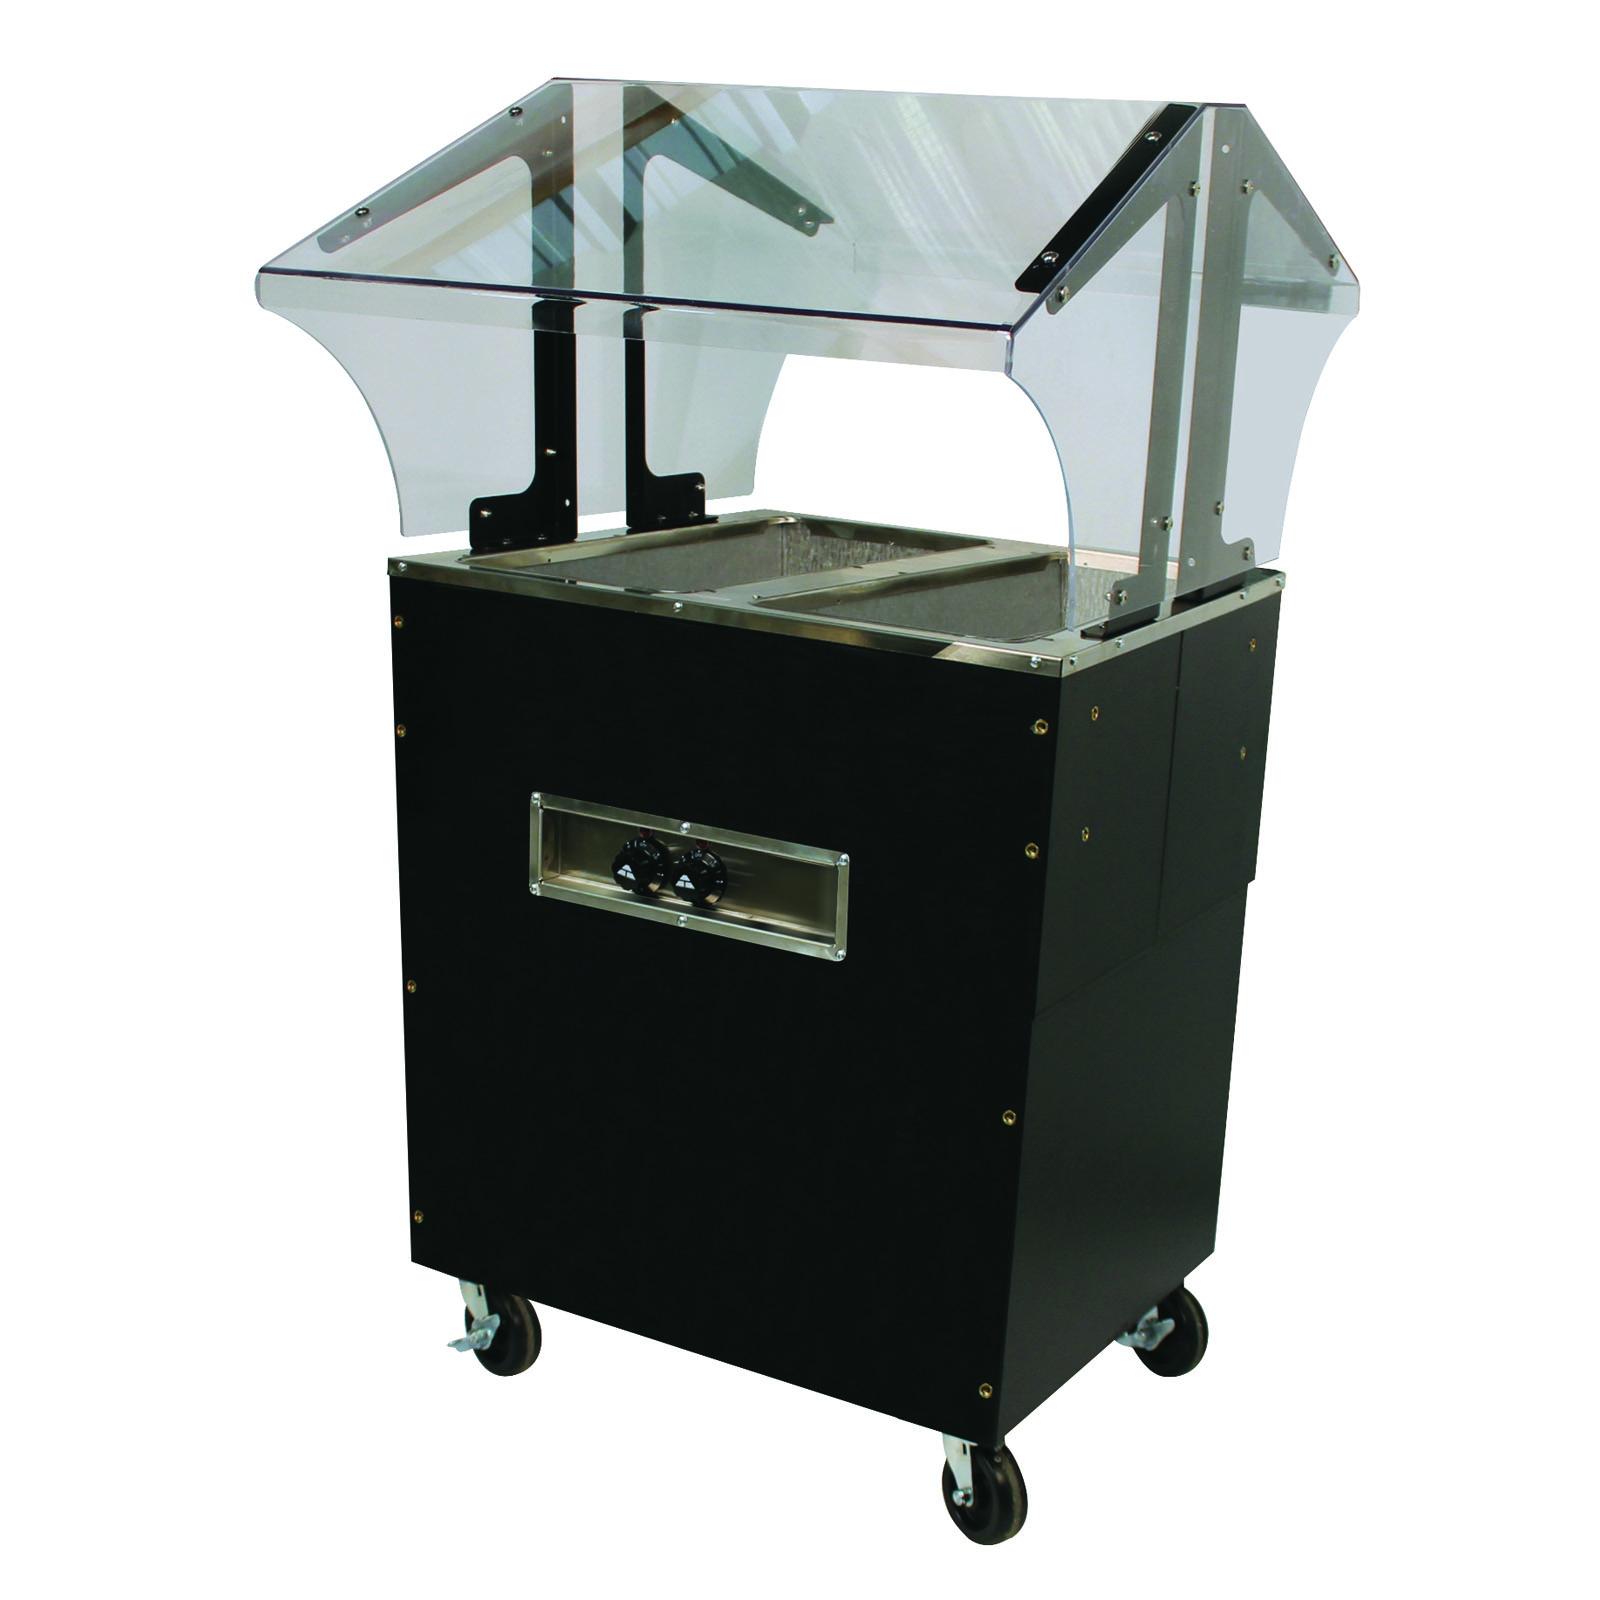 Advance Tabco B2-120-B-SB serving counter, hot food, electric